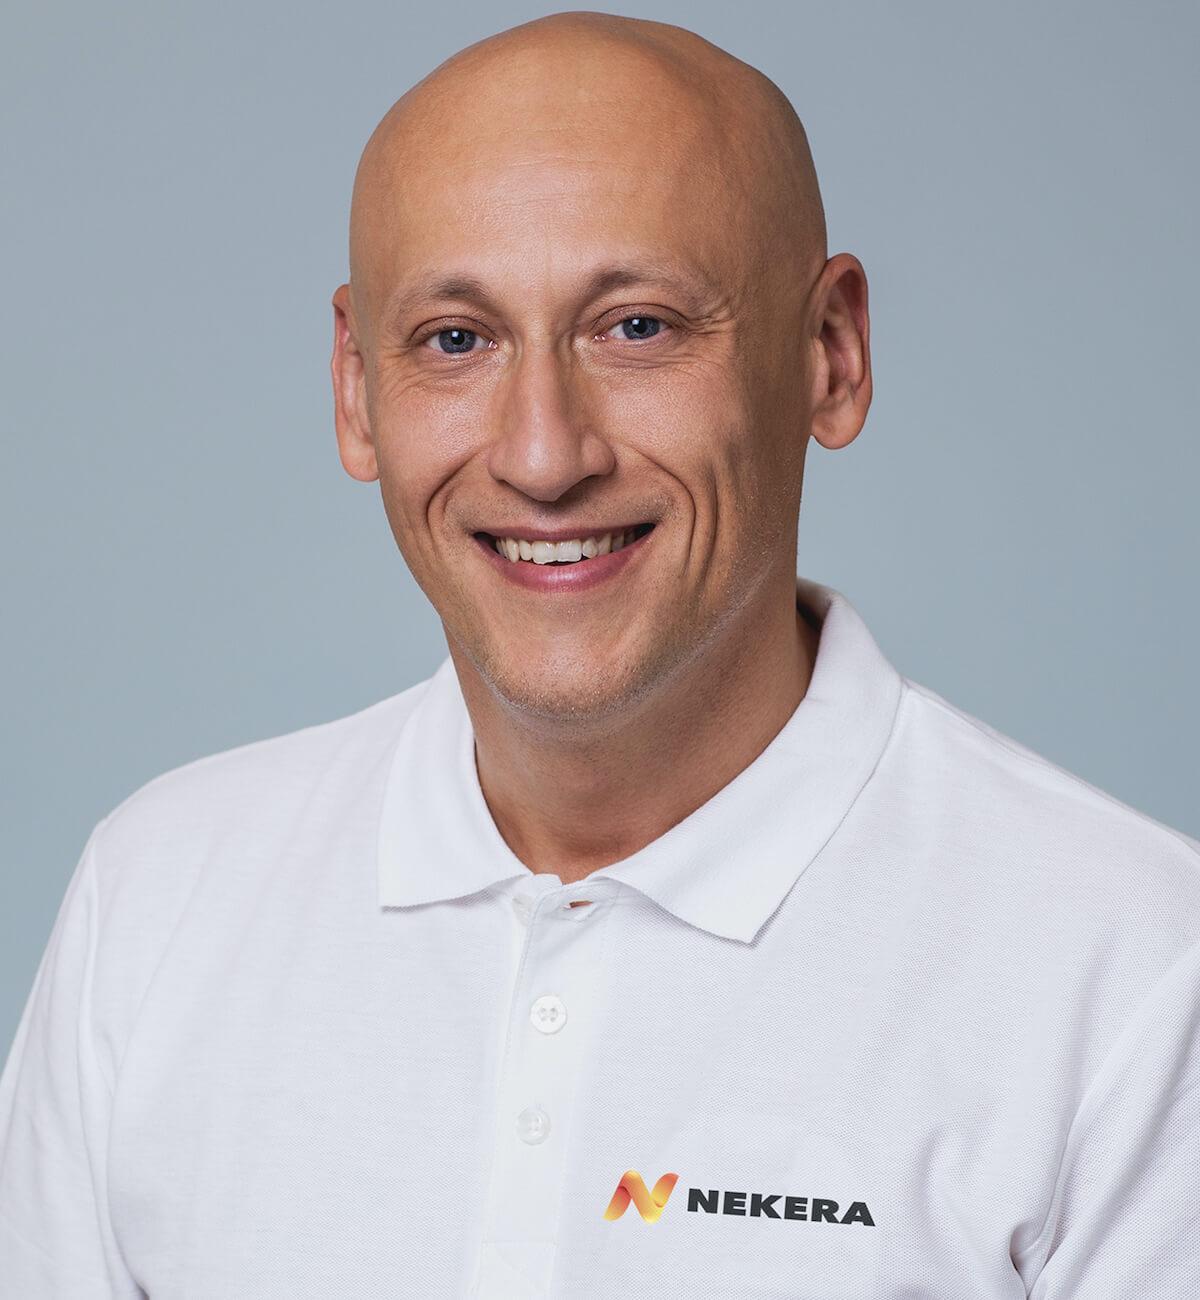 Artur Godlewski Nekera